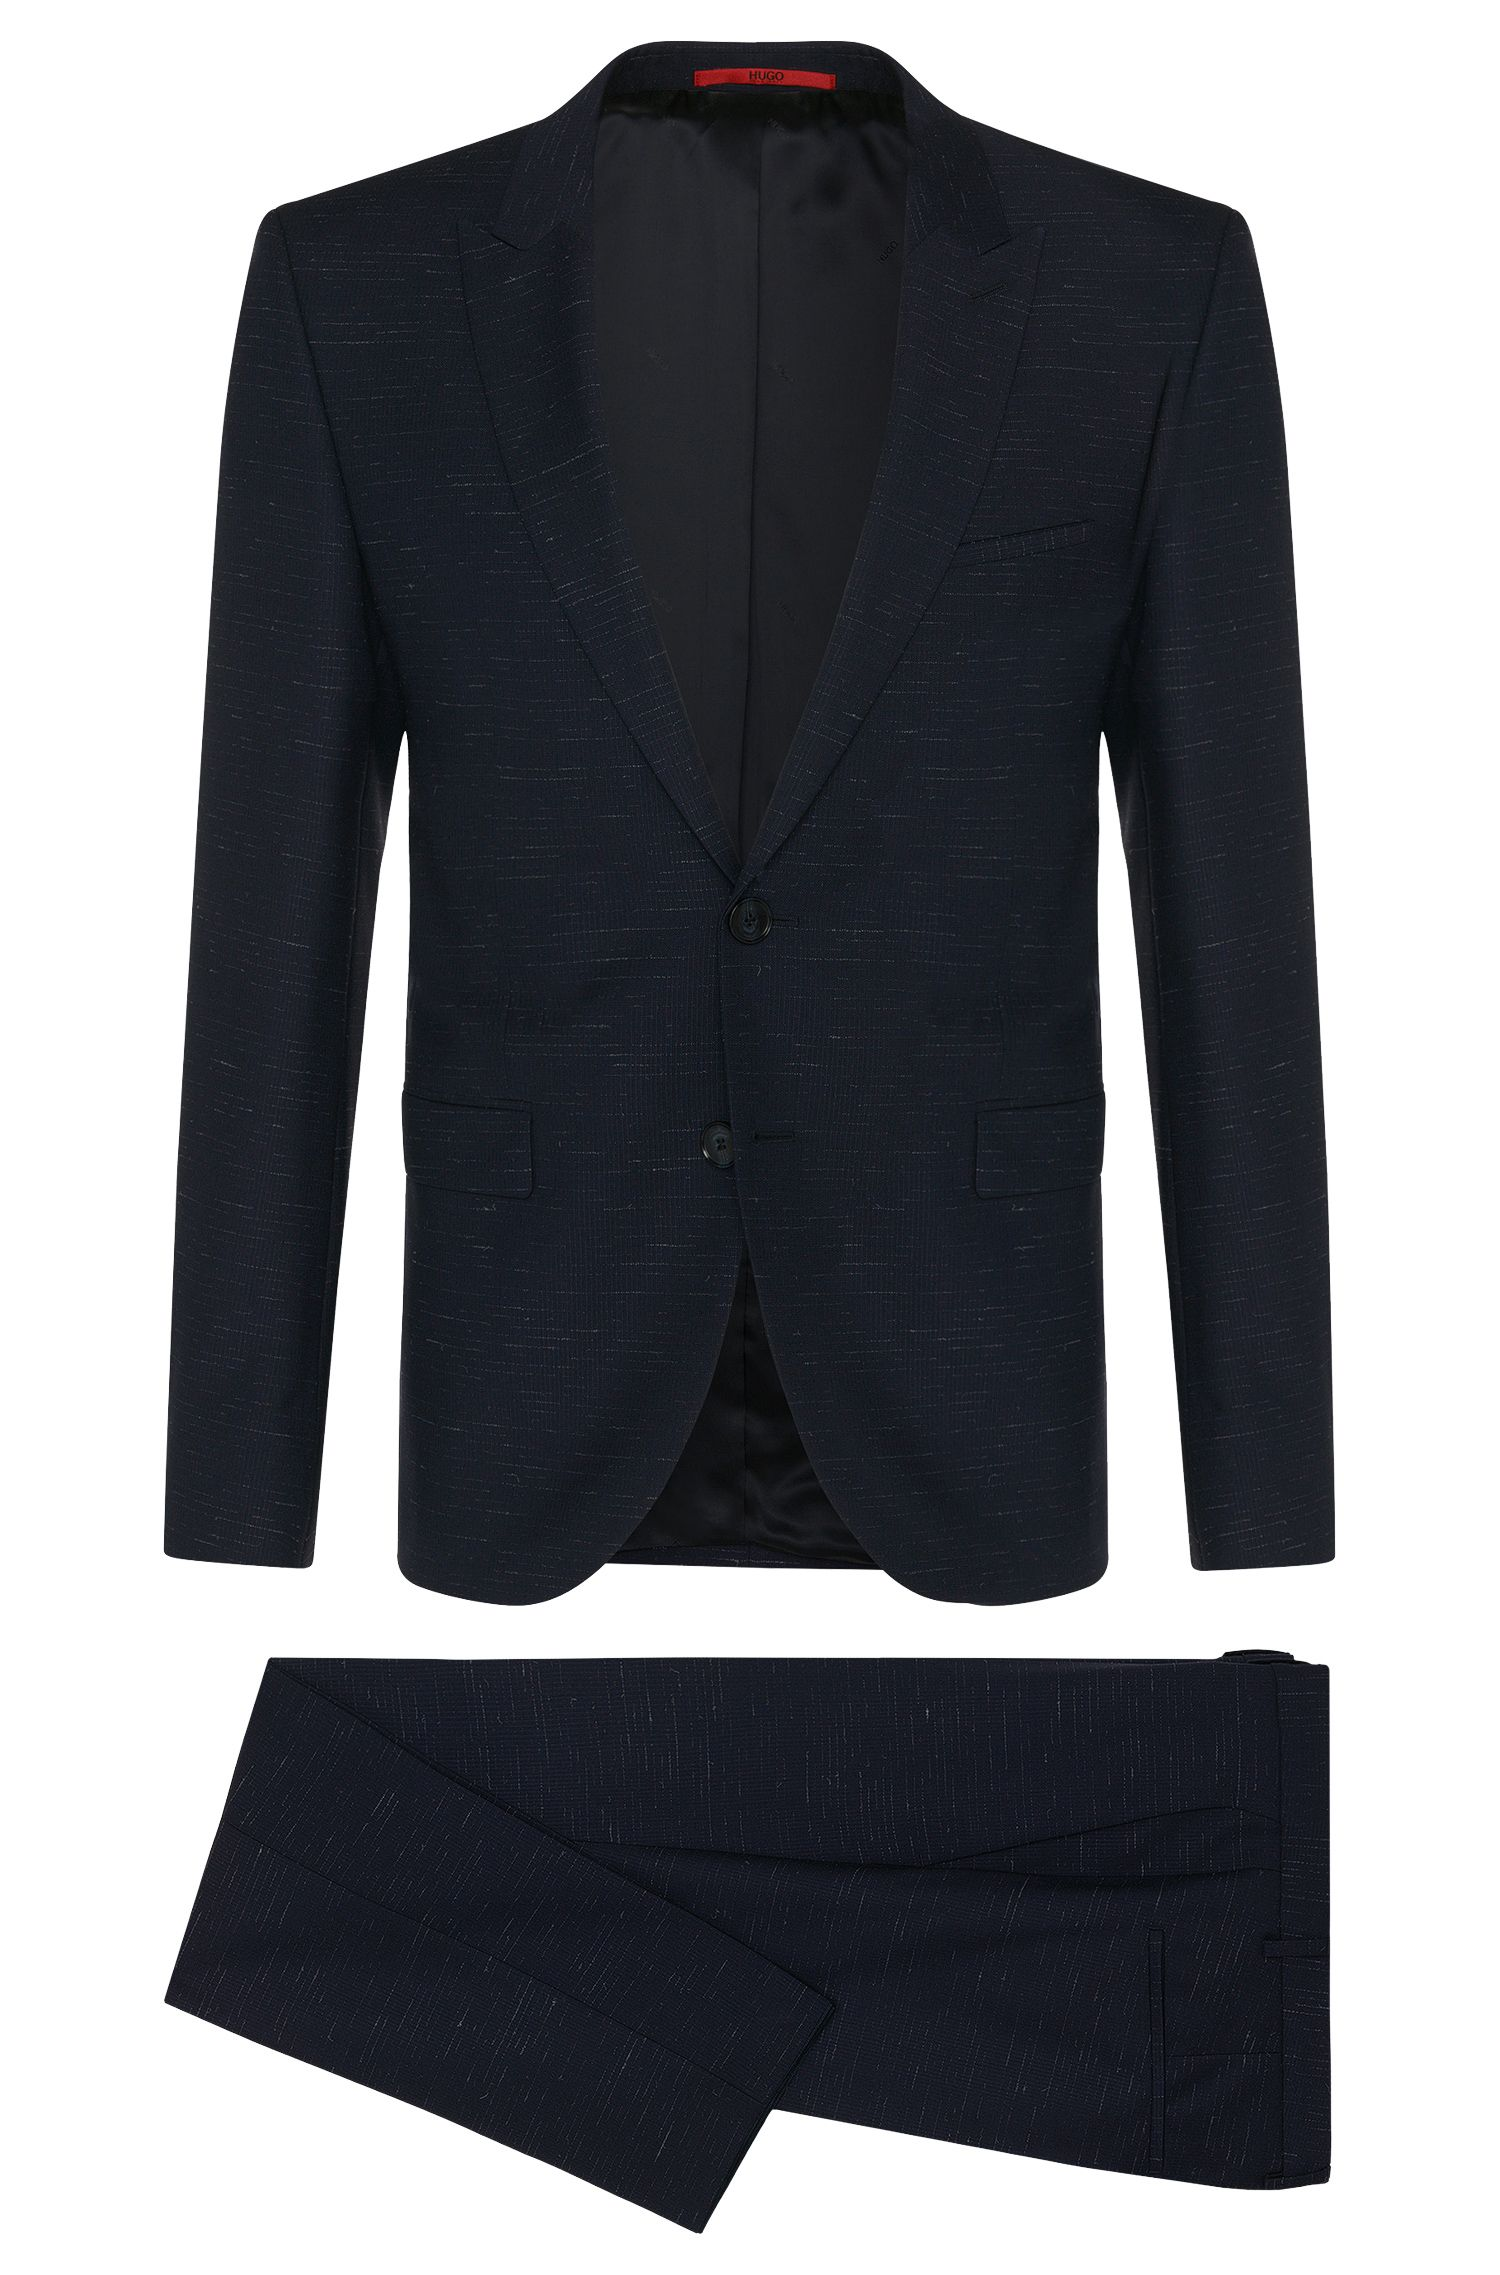 Super 110 Virgin Wool Suit, Extra-Slim Fit| Astor/Hends